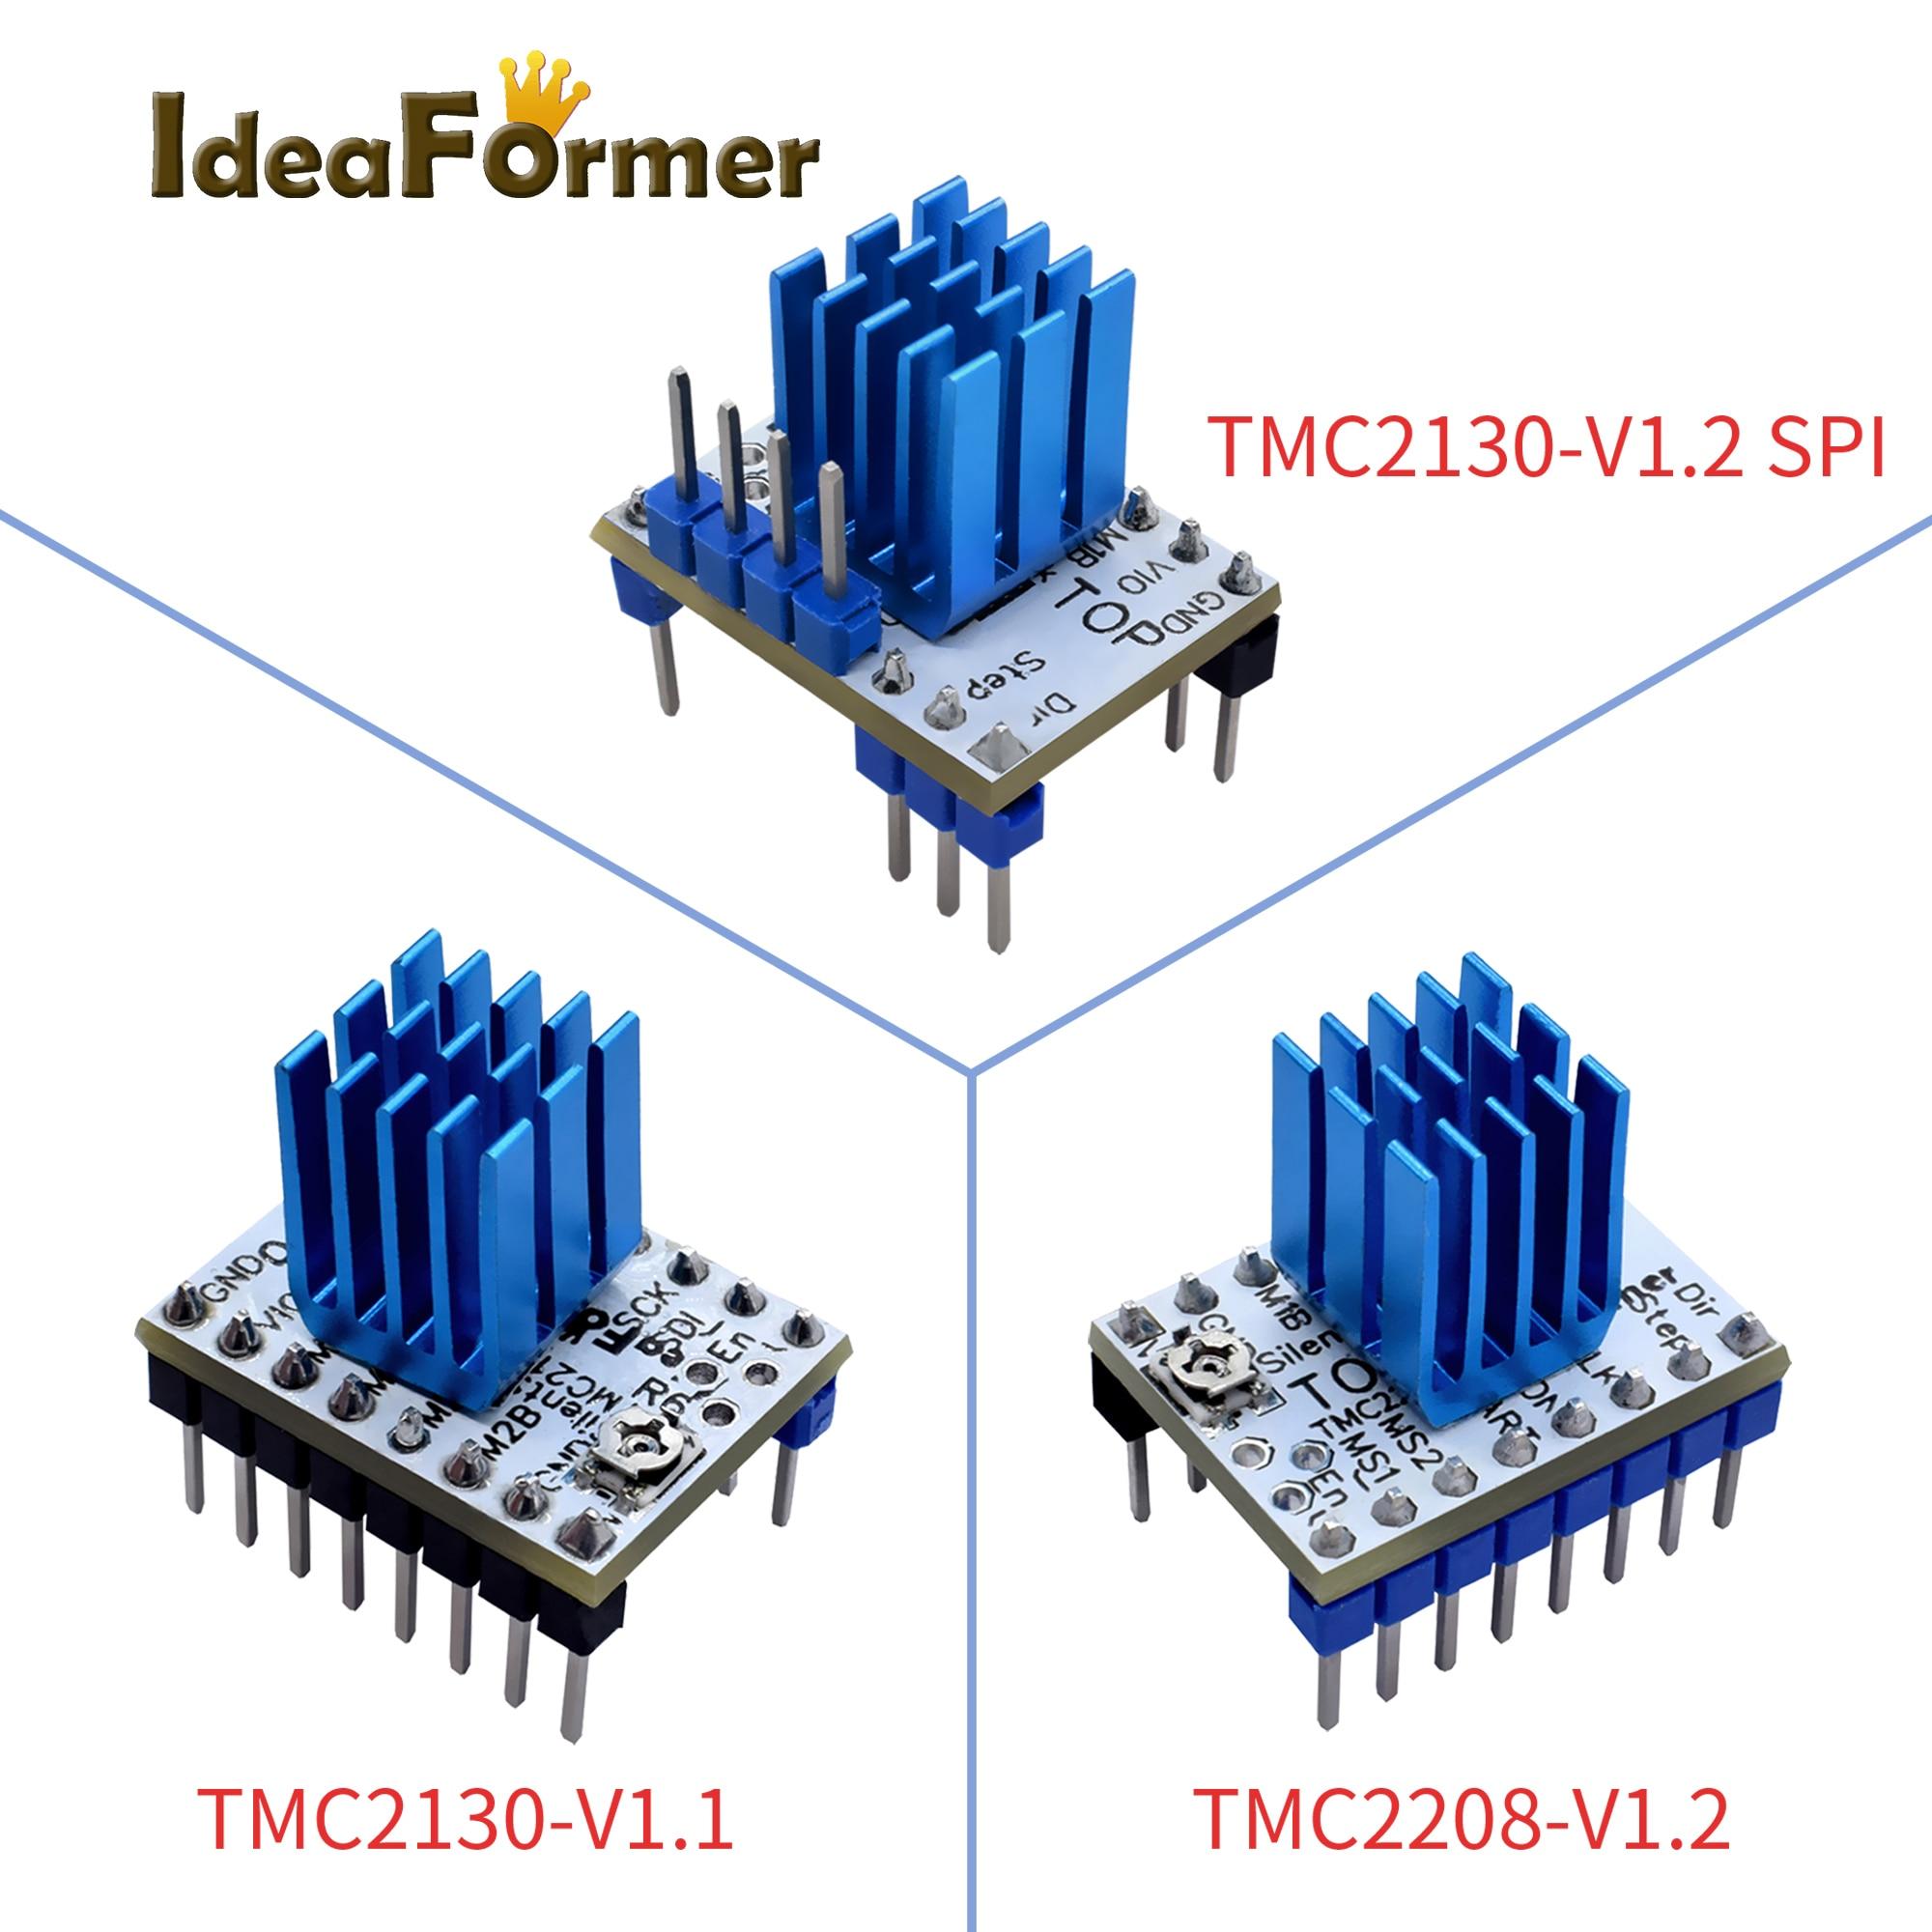 1/2/4/5pcs TMC2130 V1.1 TMC2130 V1.2 SPI TMC2208 V1.2 StepStick TMC Stepper Motor3D Driver Silent Excellent Stability Protection